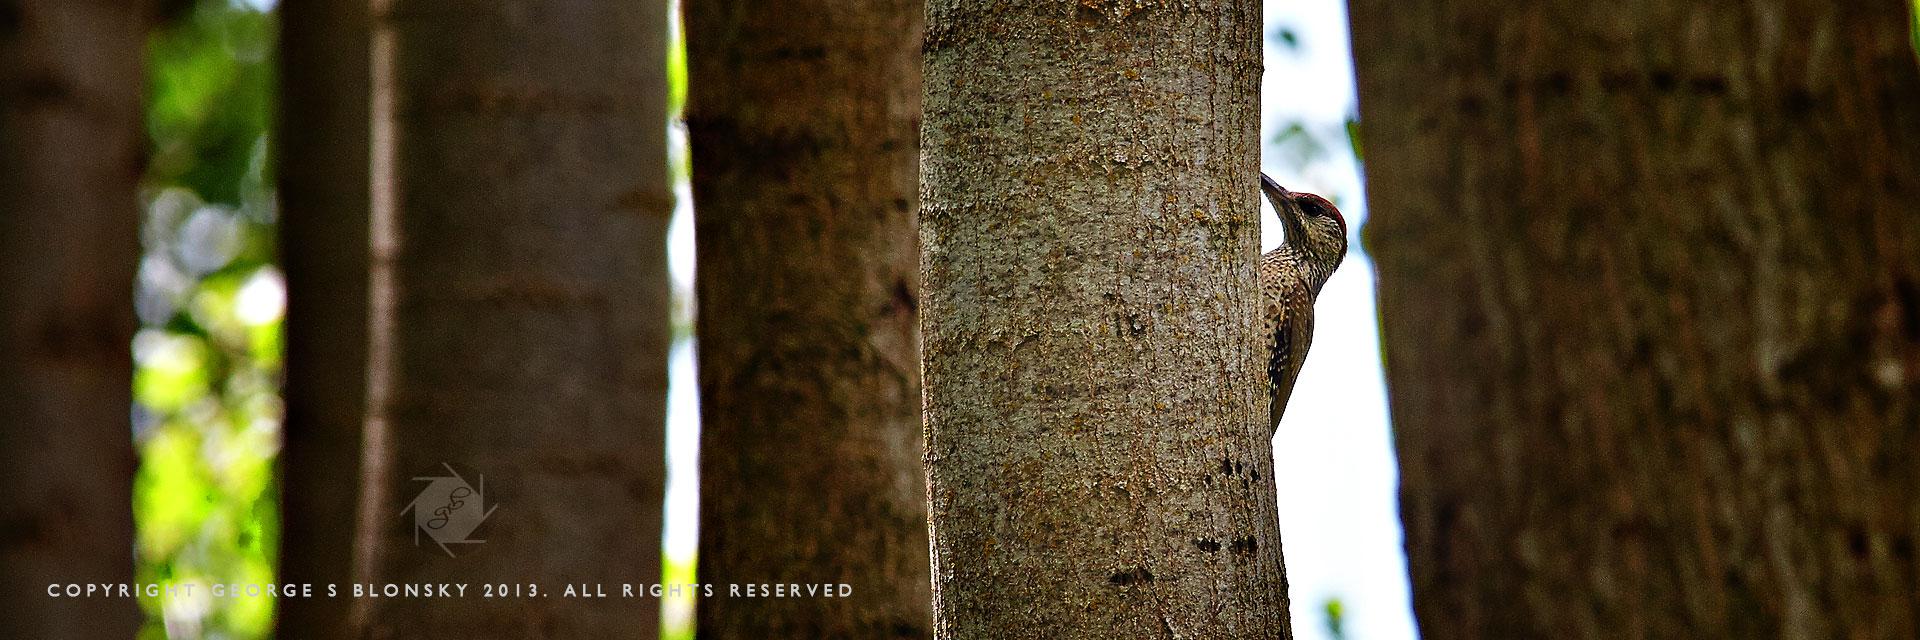 Juvenile Green Woodpecker at Lake Kerkini